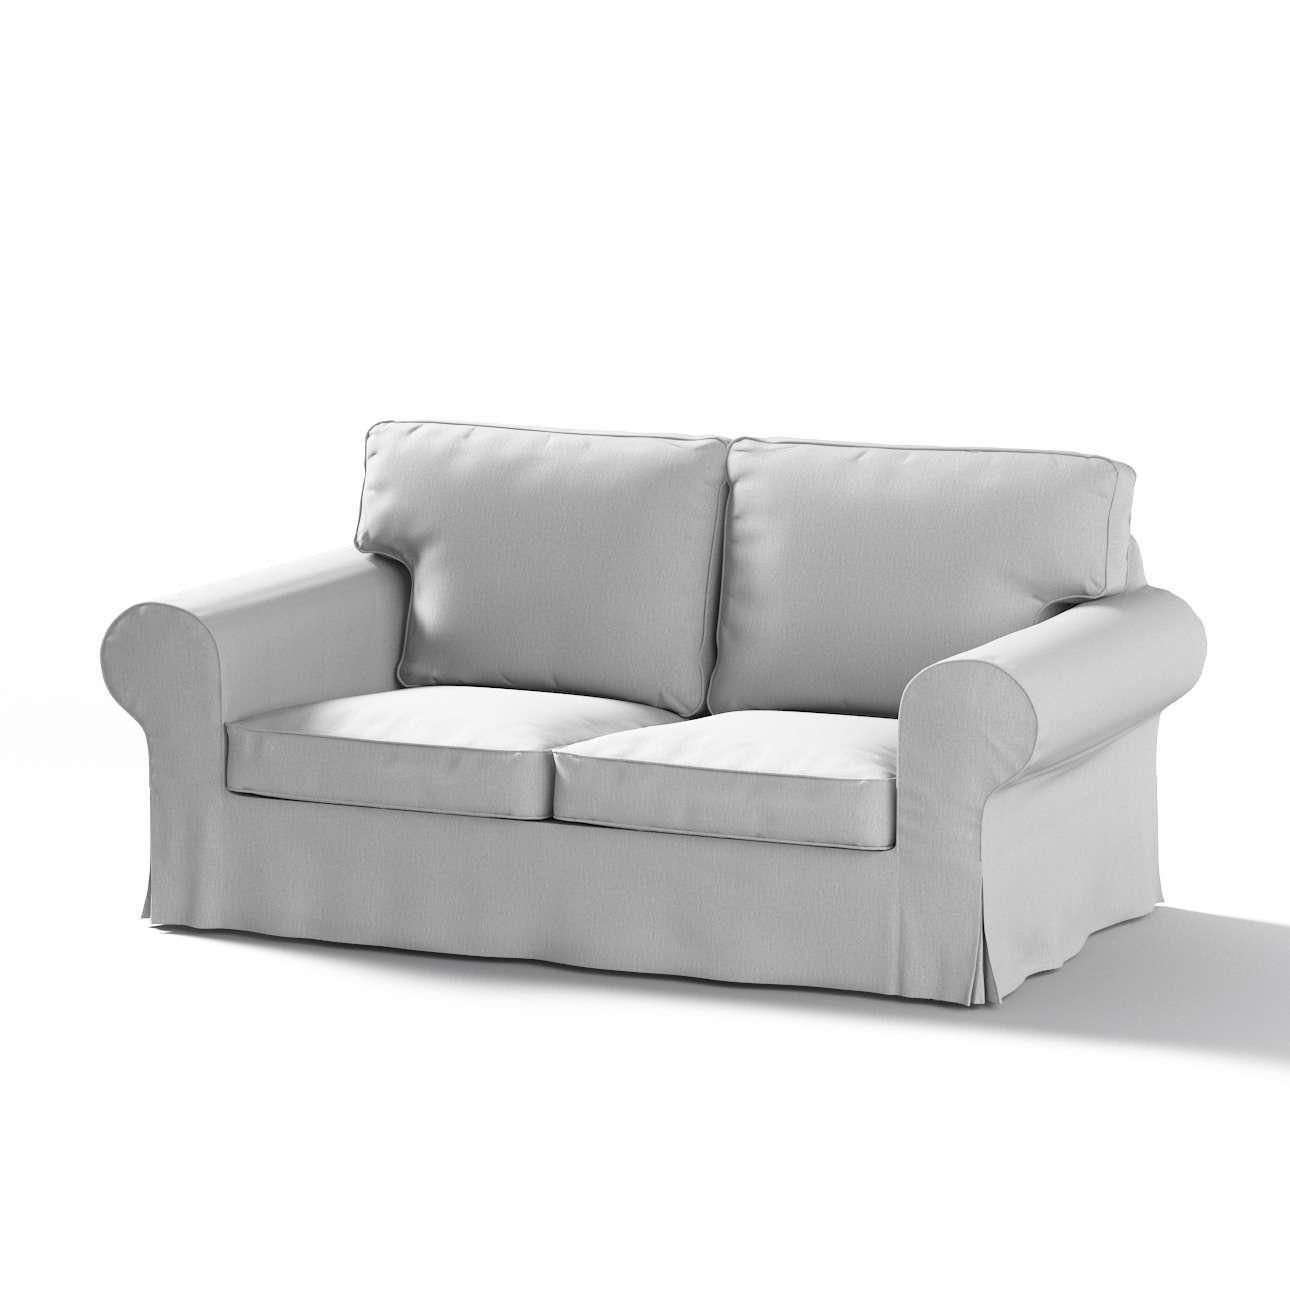 Ektorp 2 sæder sovesofa gammel model<br/>Bredde ca 195cm Betræk uden sofa fra kollektionen Chenille, Stof: 702-23